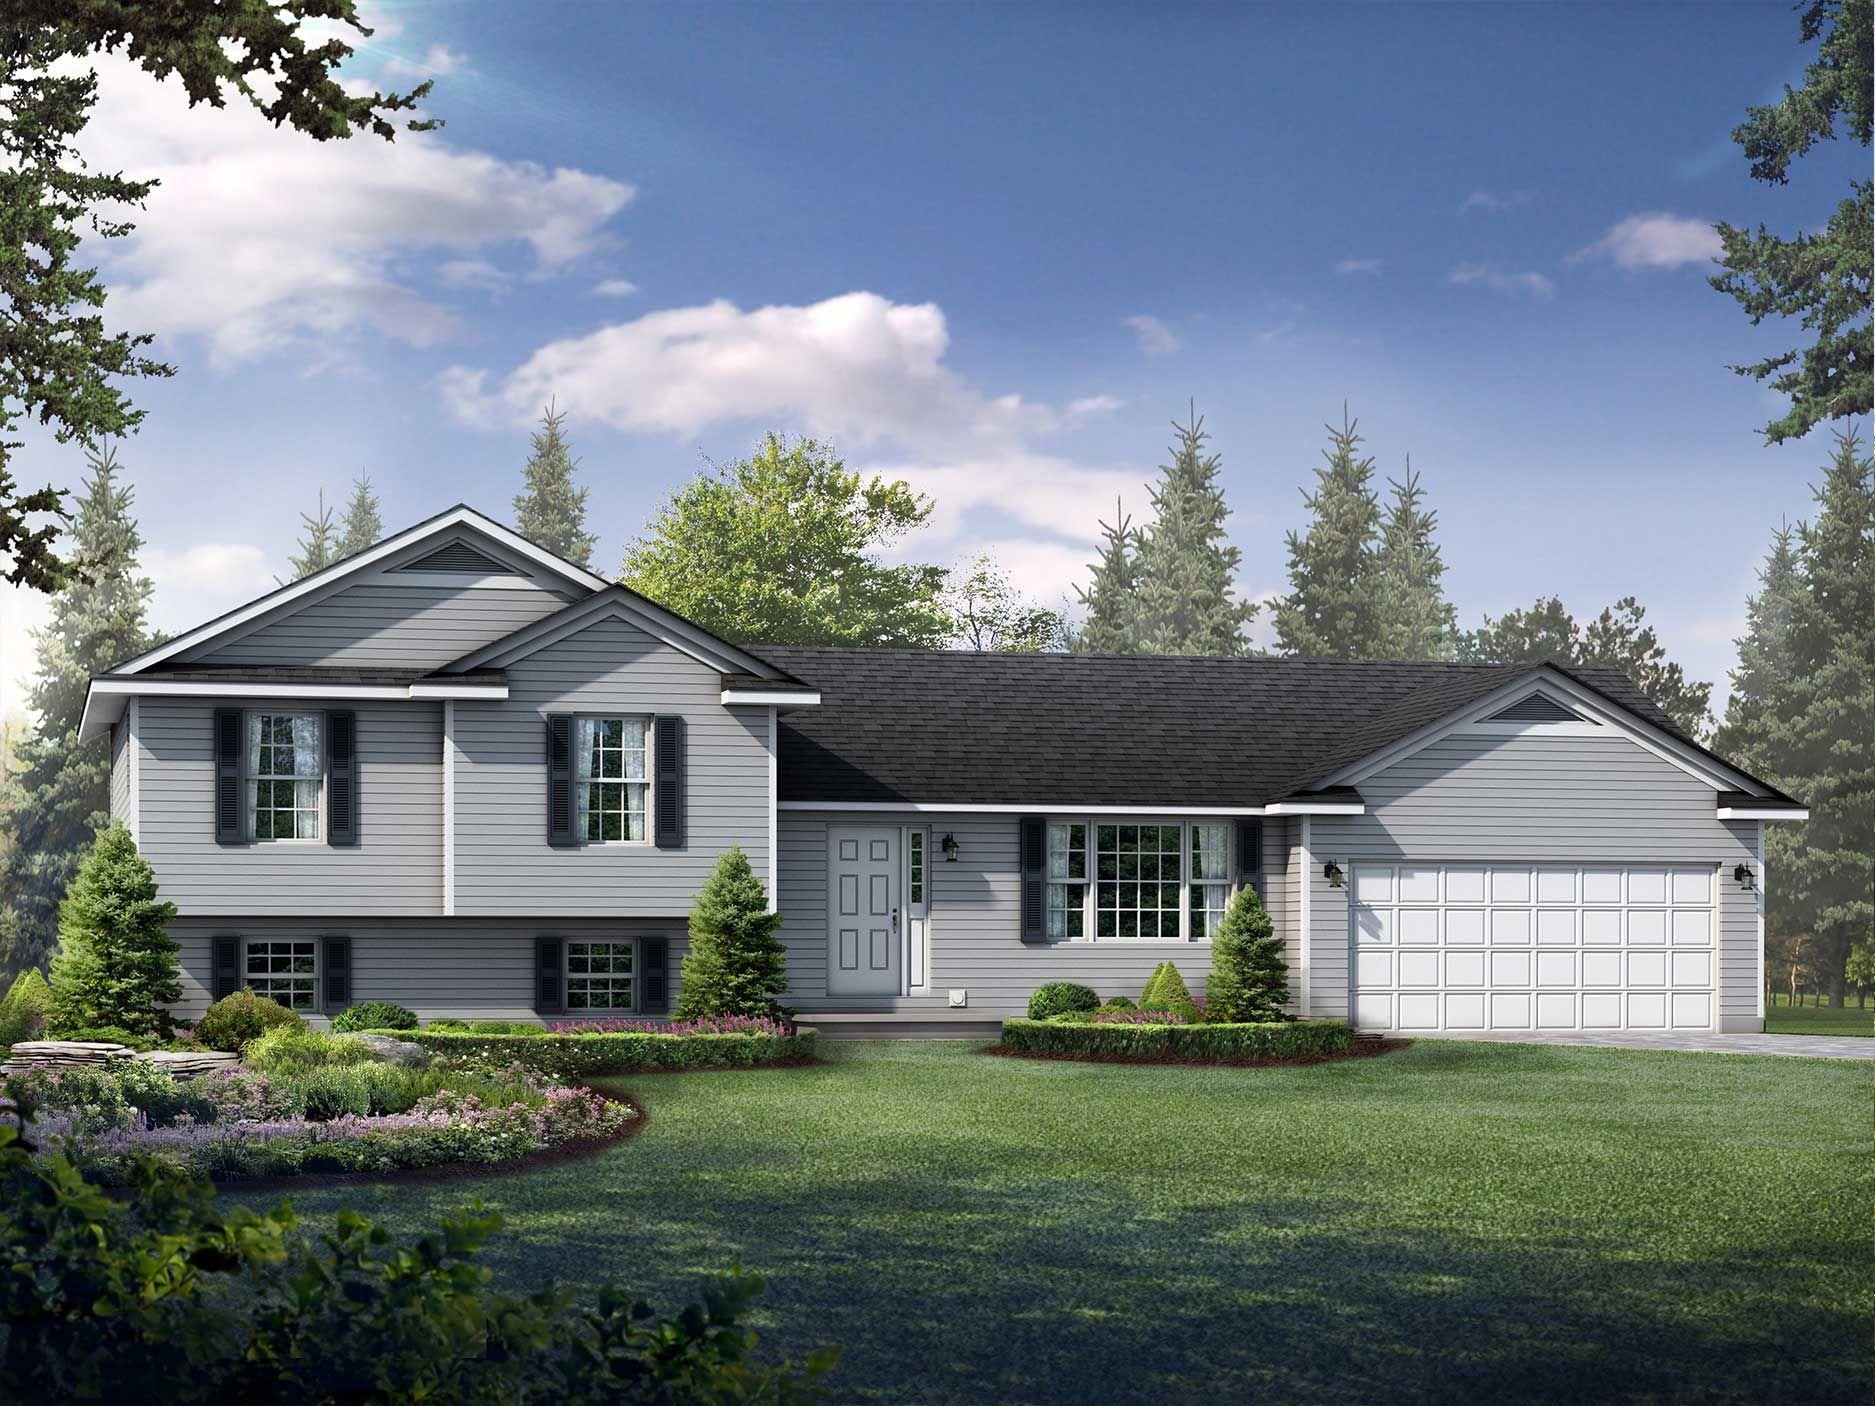 Lexington Floor Plan SplitLevel Custom Home (With images